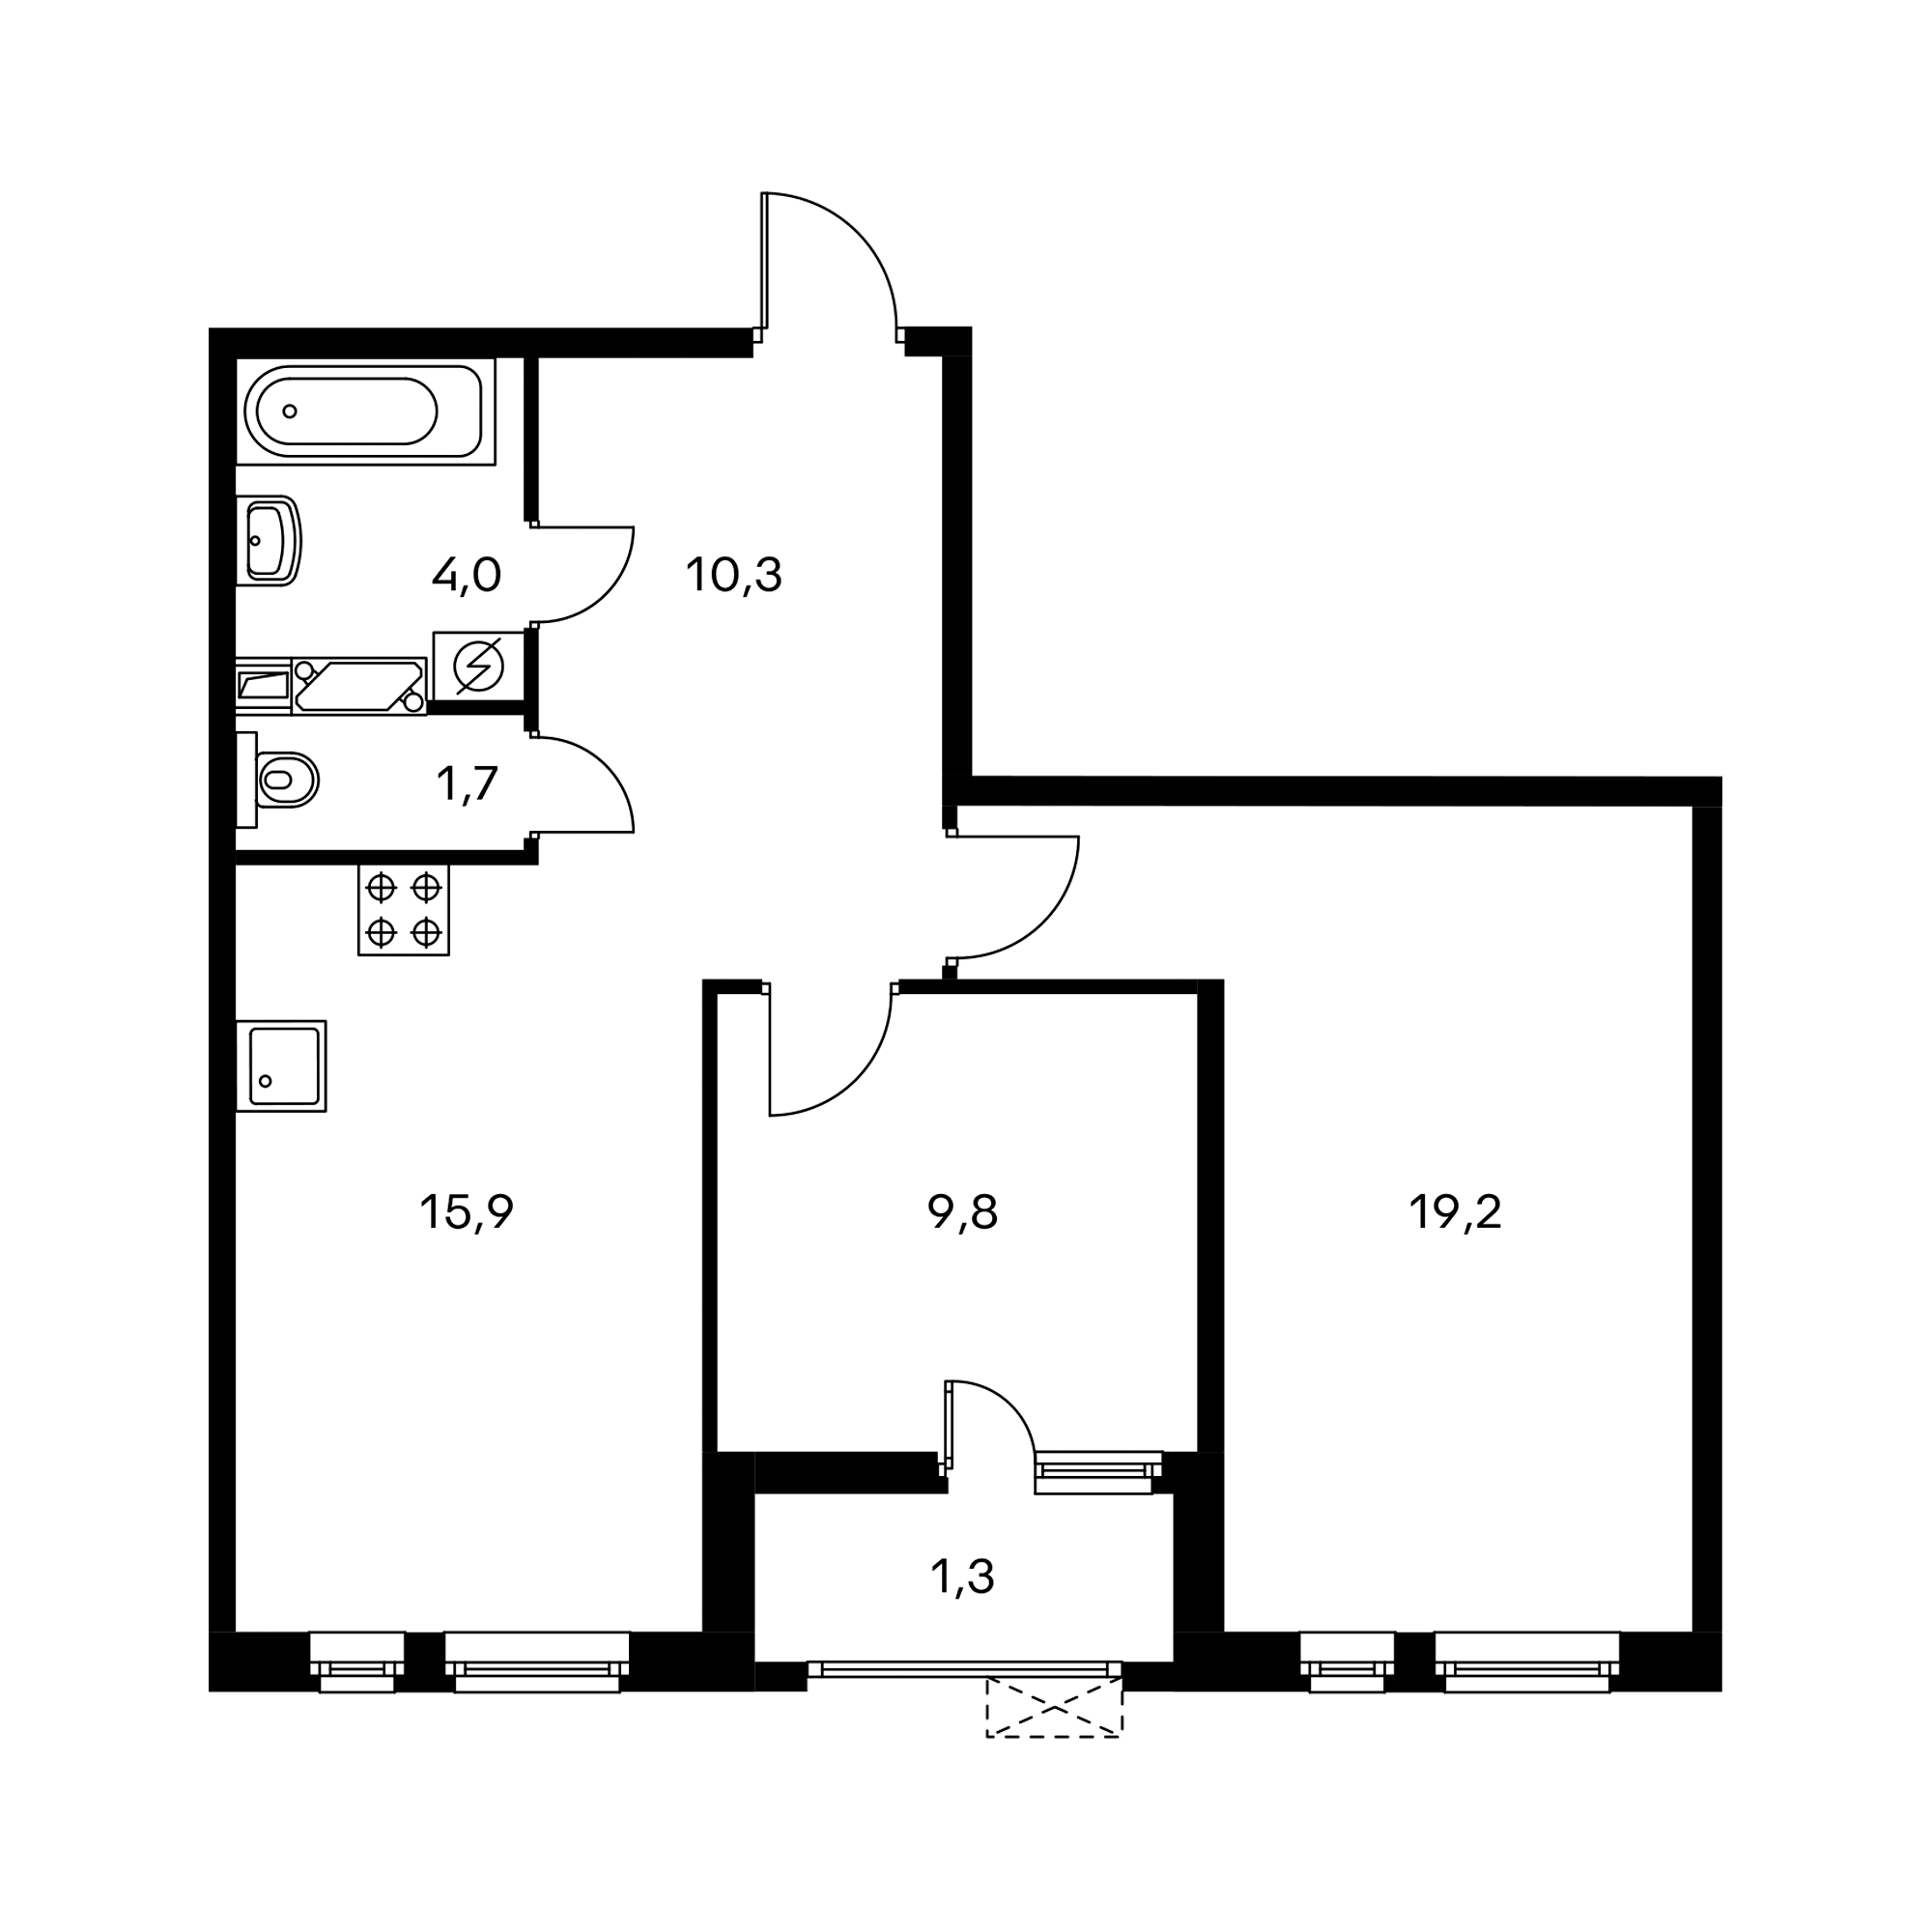 2-2(1Д)